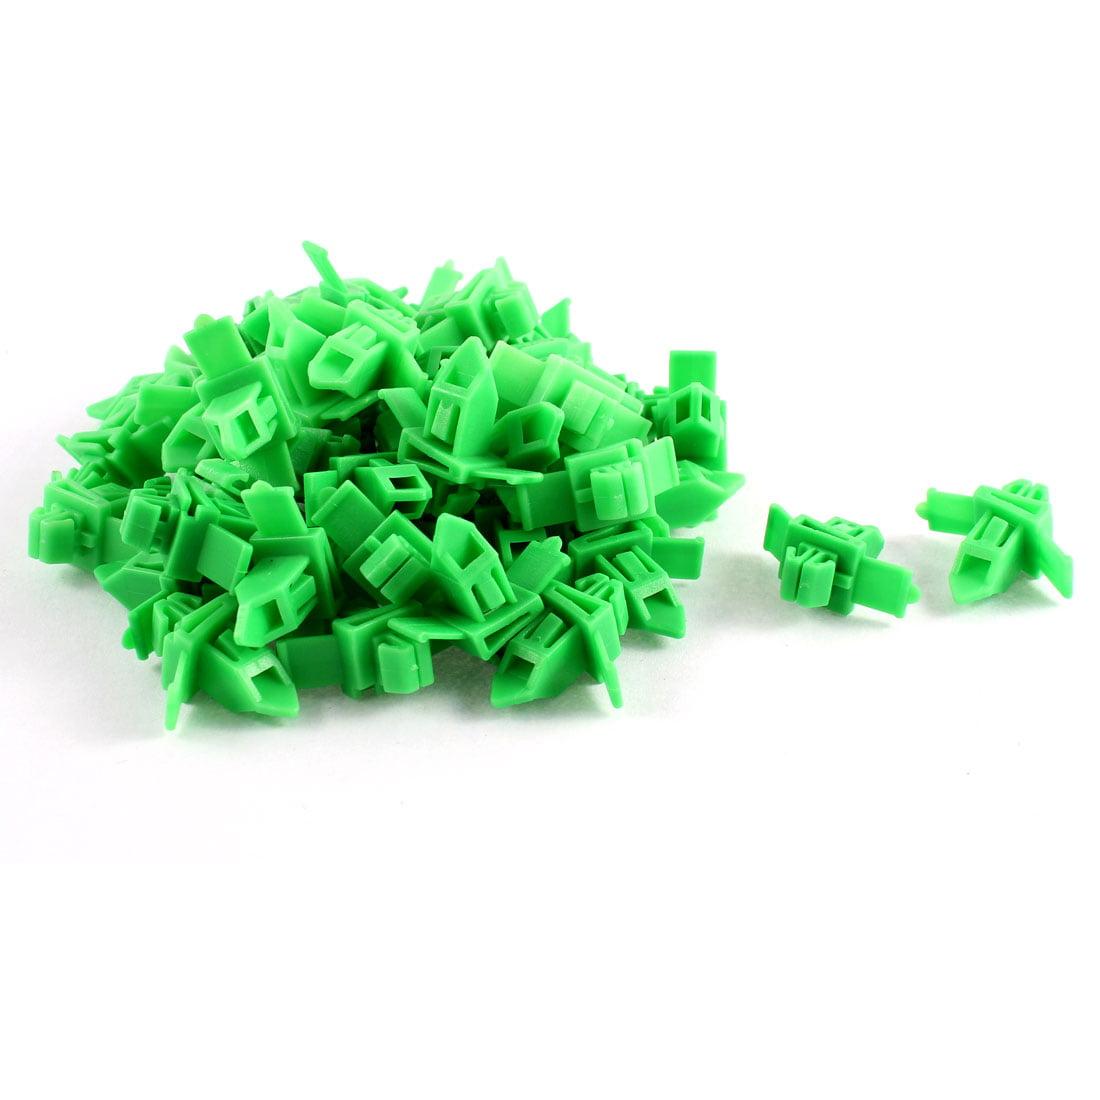 Unique Bargains 50 Pcs Green Plastic Rivets Fastener Fender Retainer for Toyota